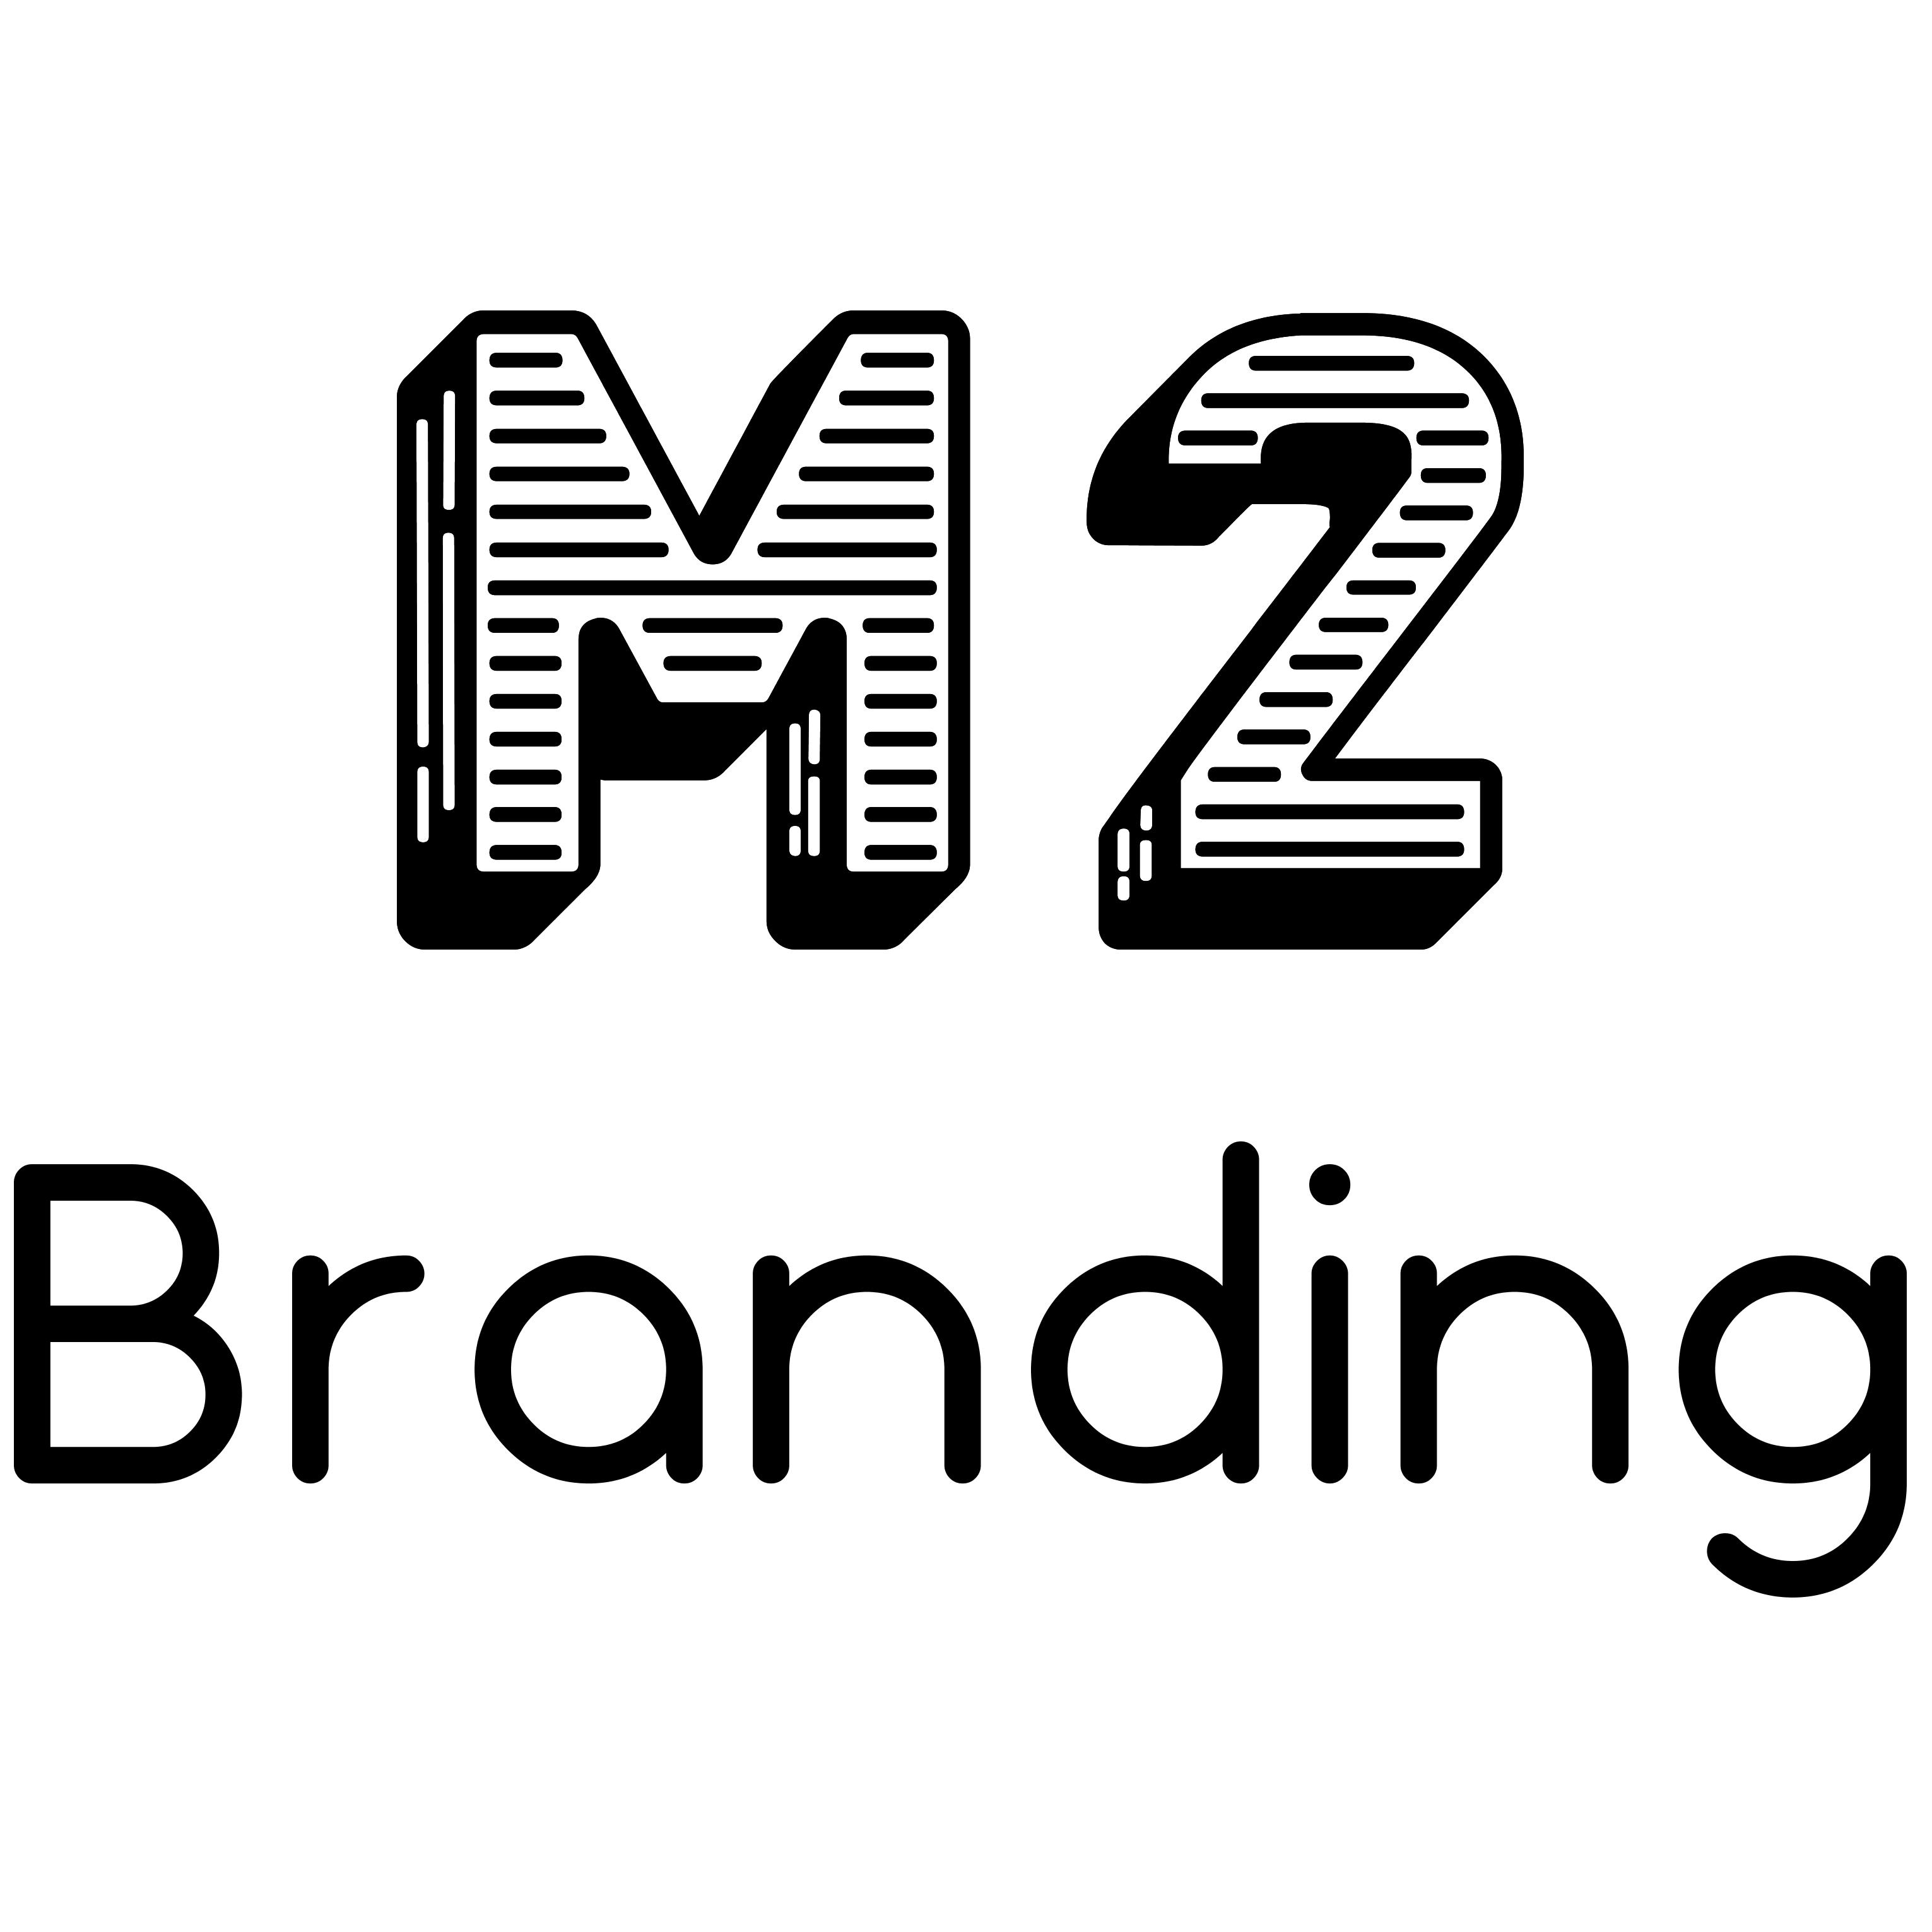 M2 Branding